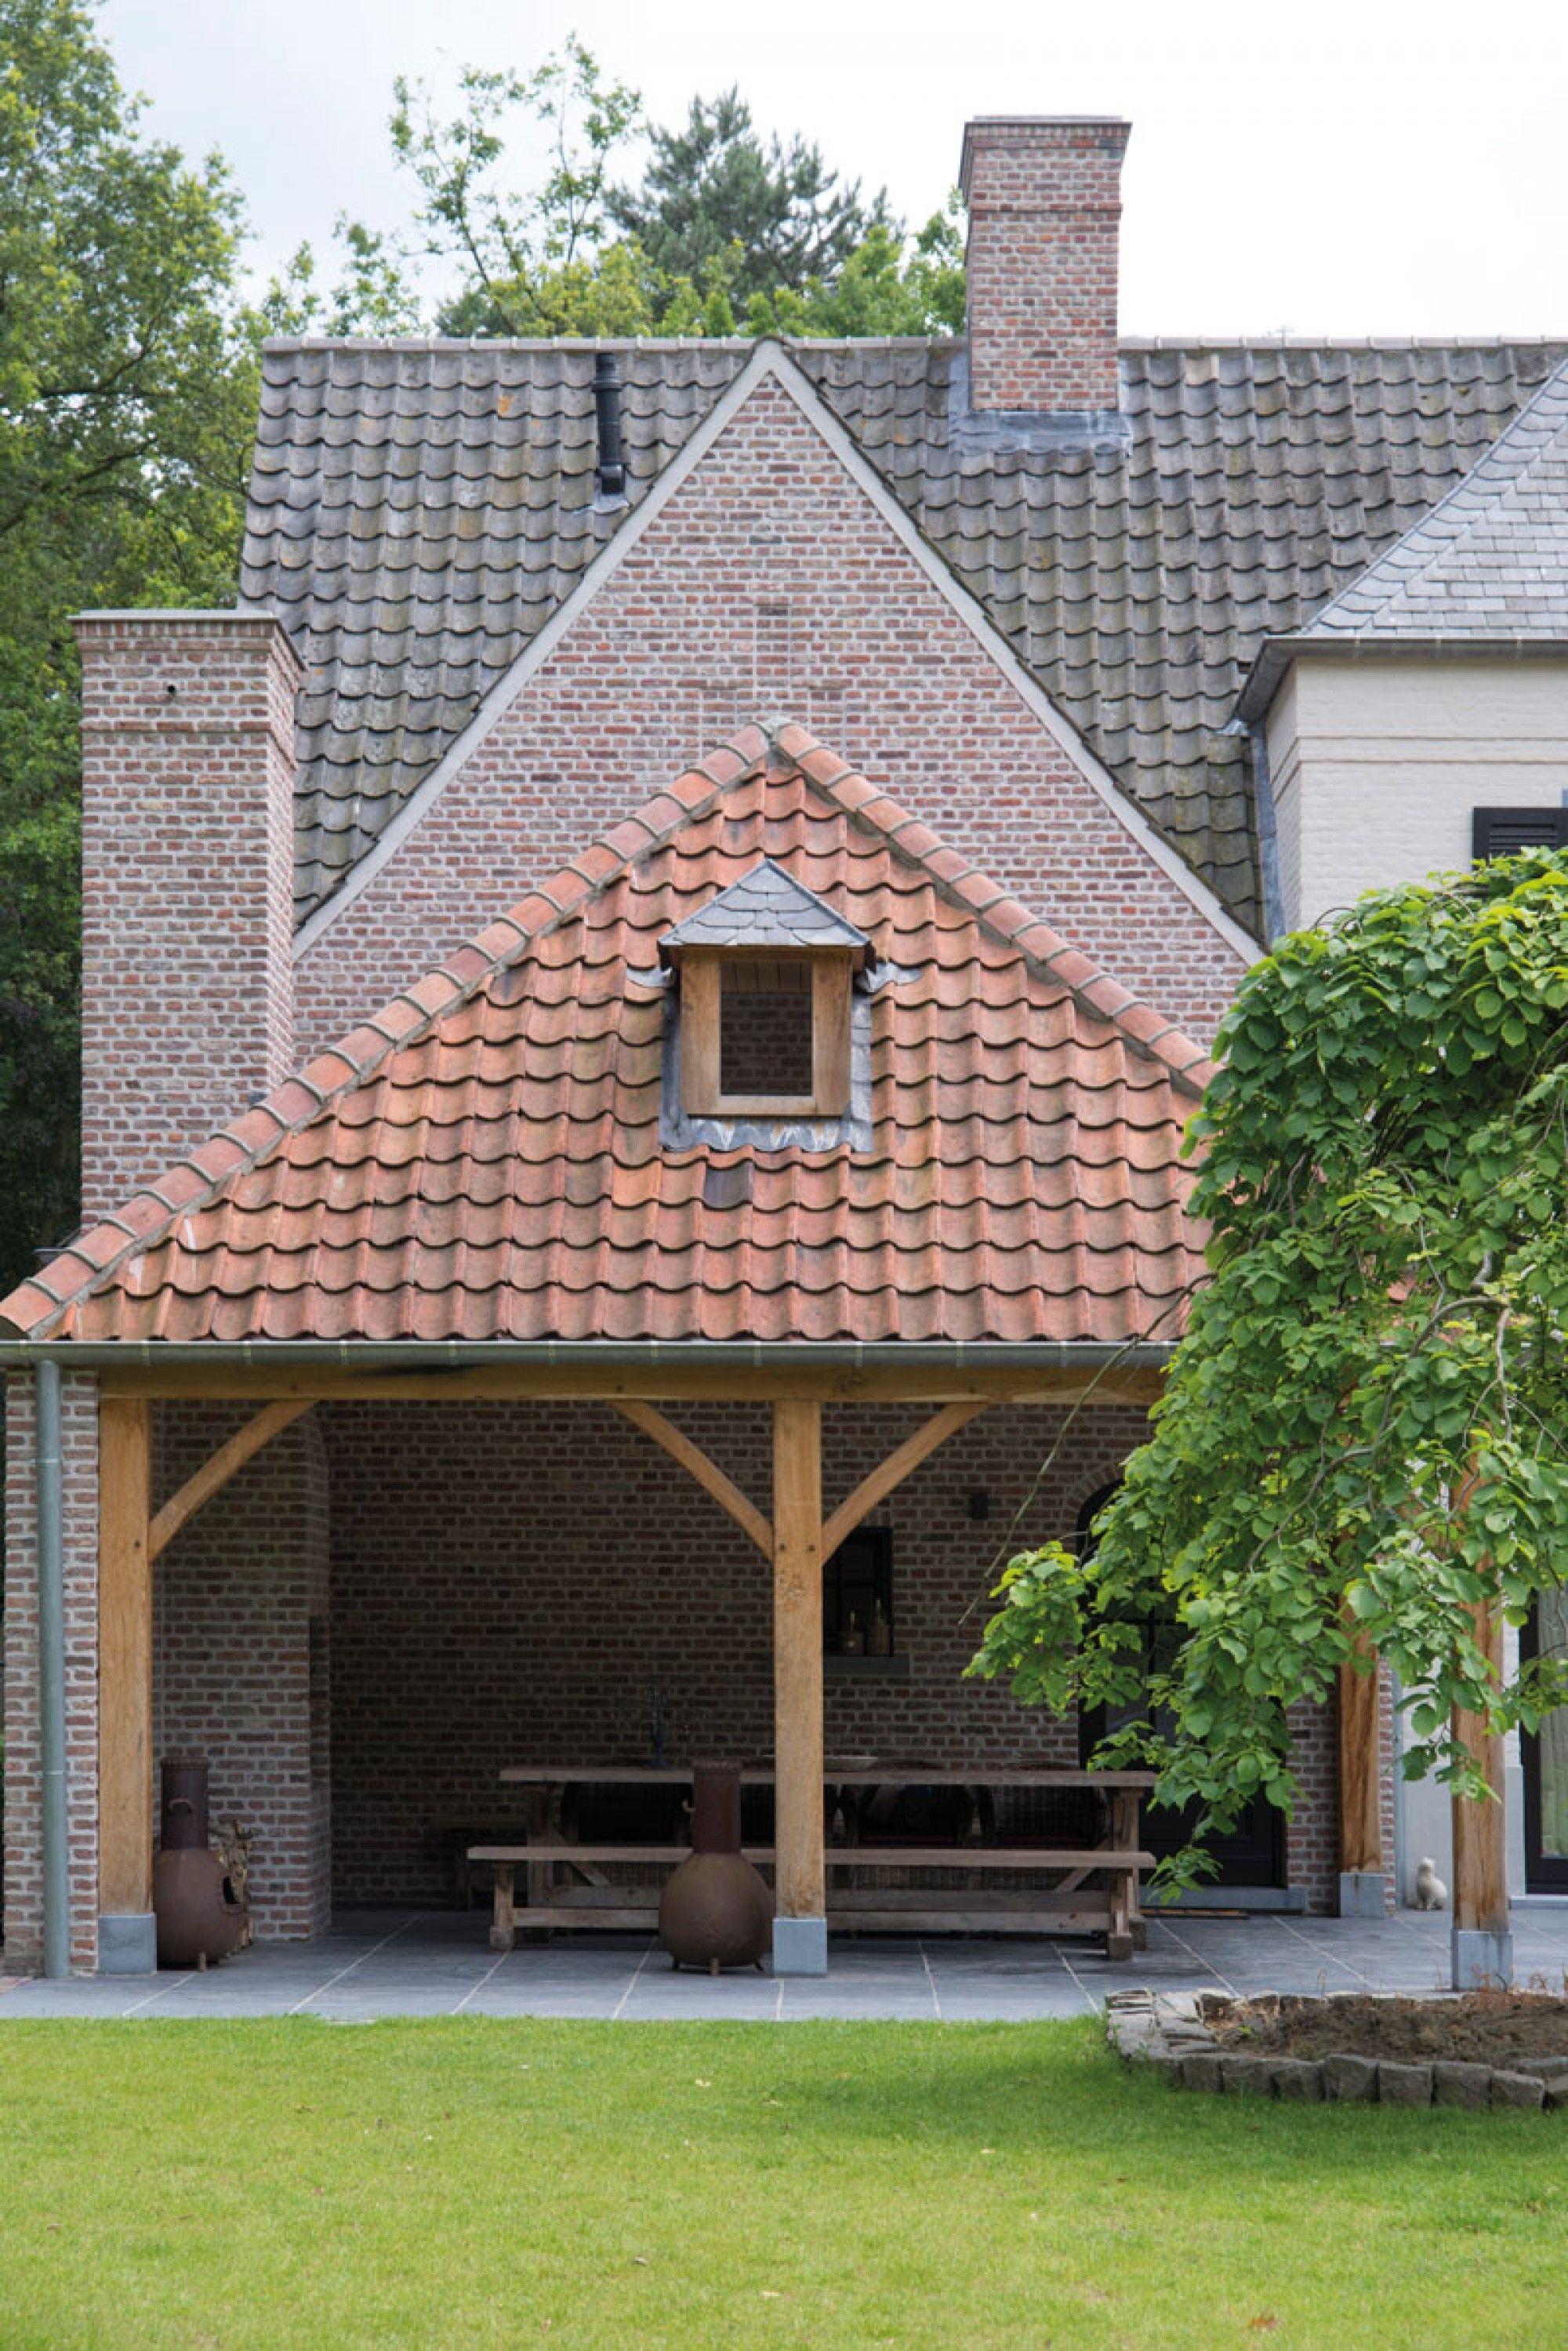 pastorij - houten afdak | huis | Pinterest | Home, House and Sweet home